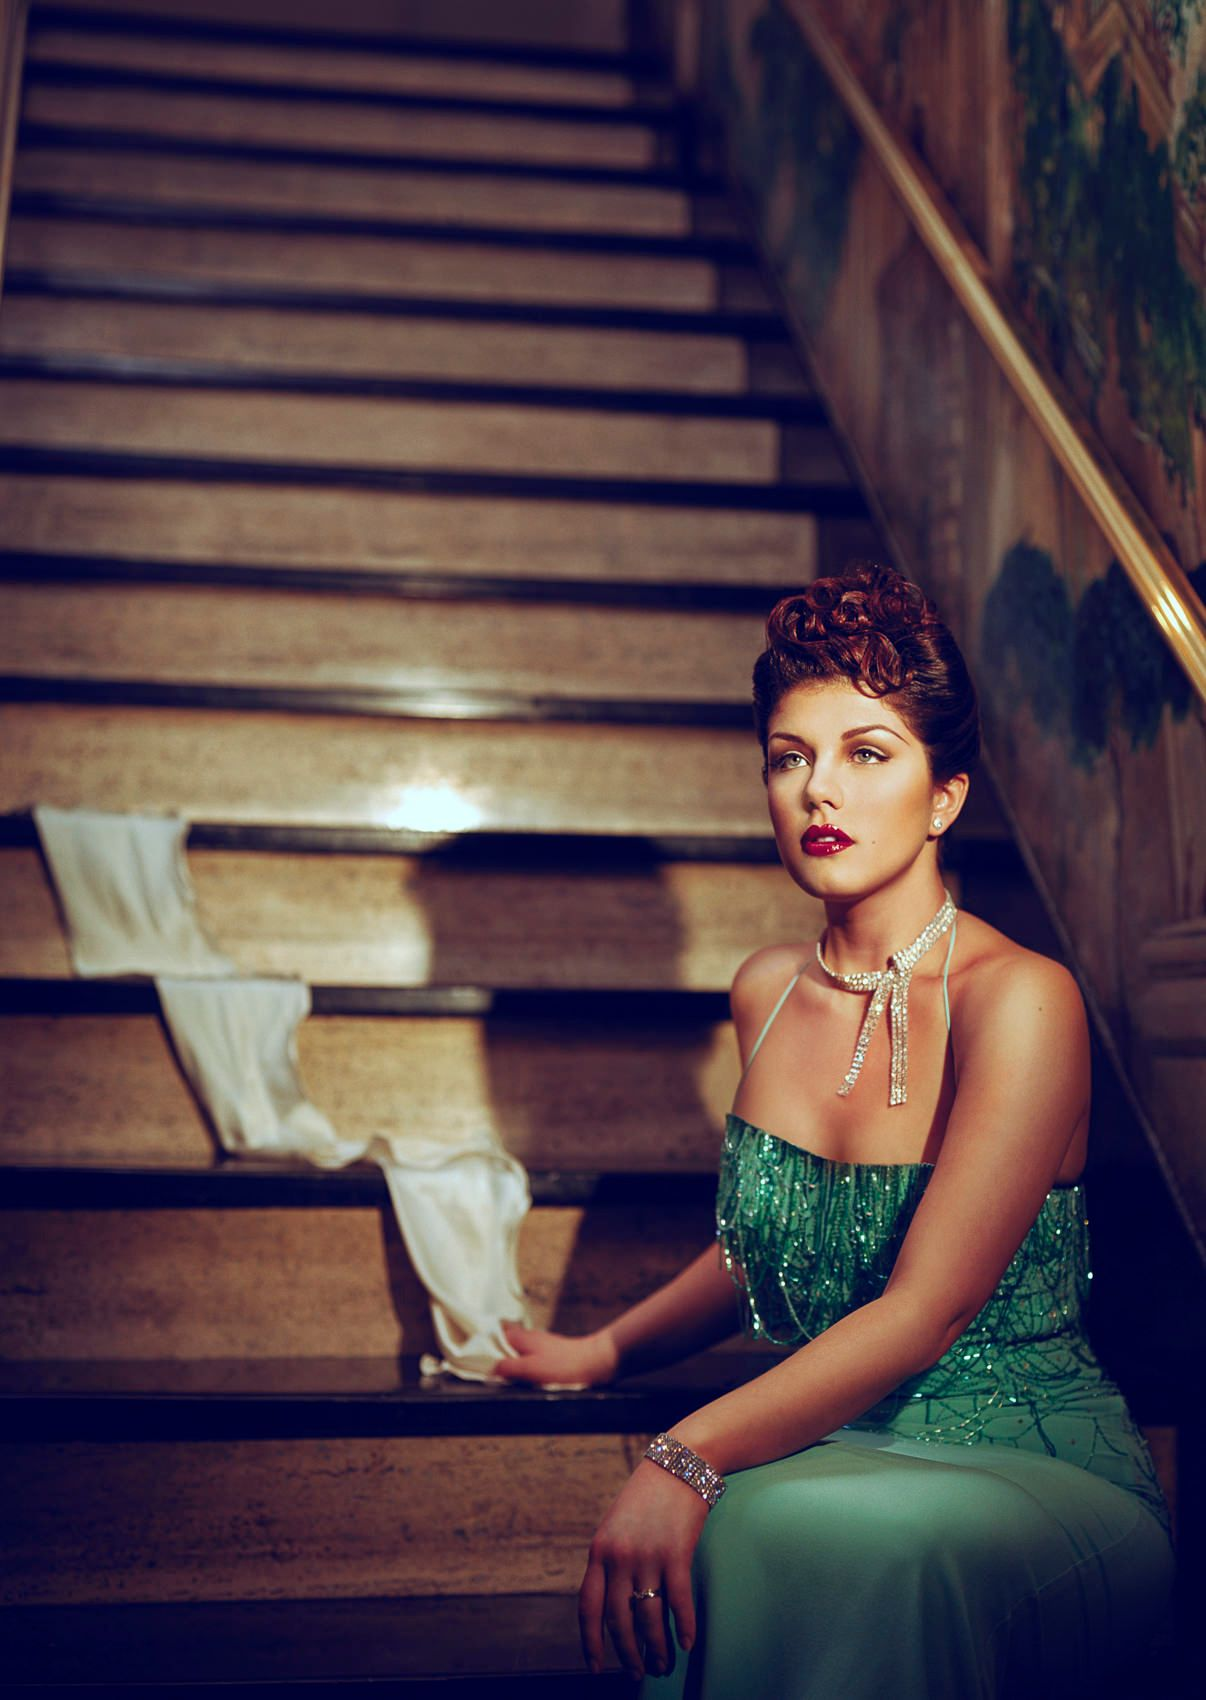 Jane-Monheit-classic-portrait.jpg